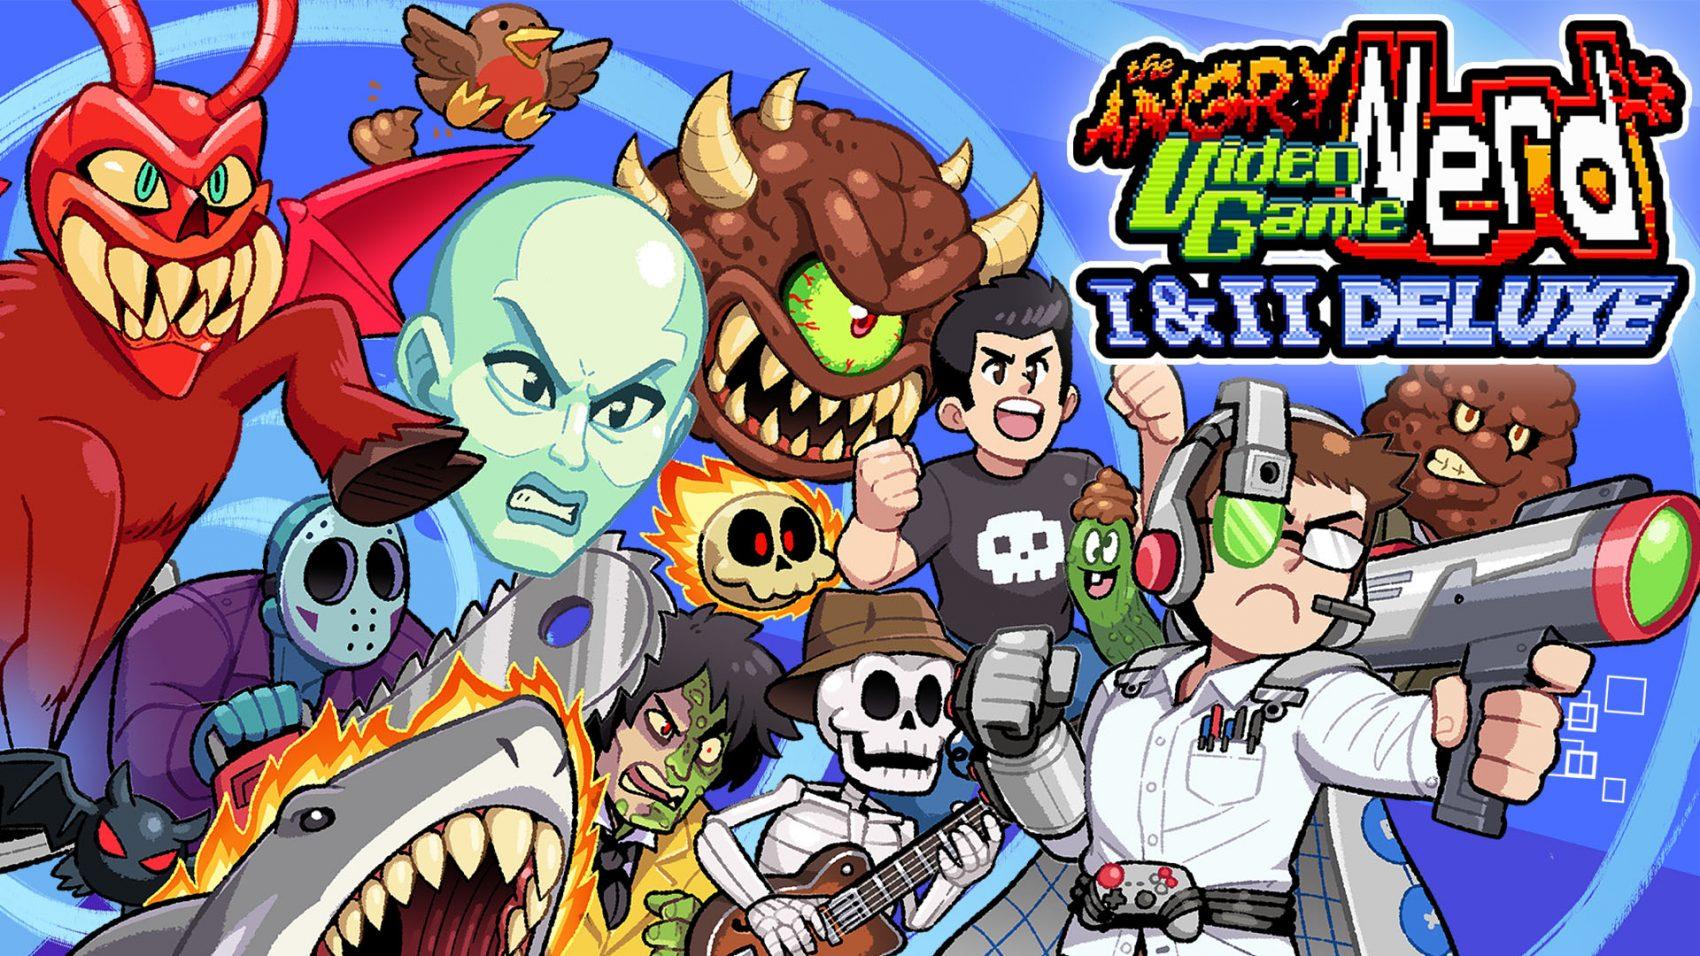 Okiem Geeka #35: Angry Video Game Nerd I& II Deluxe